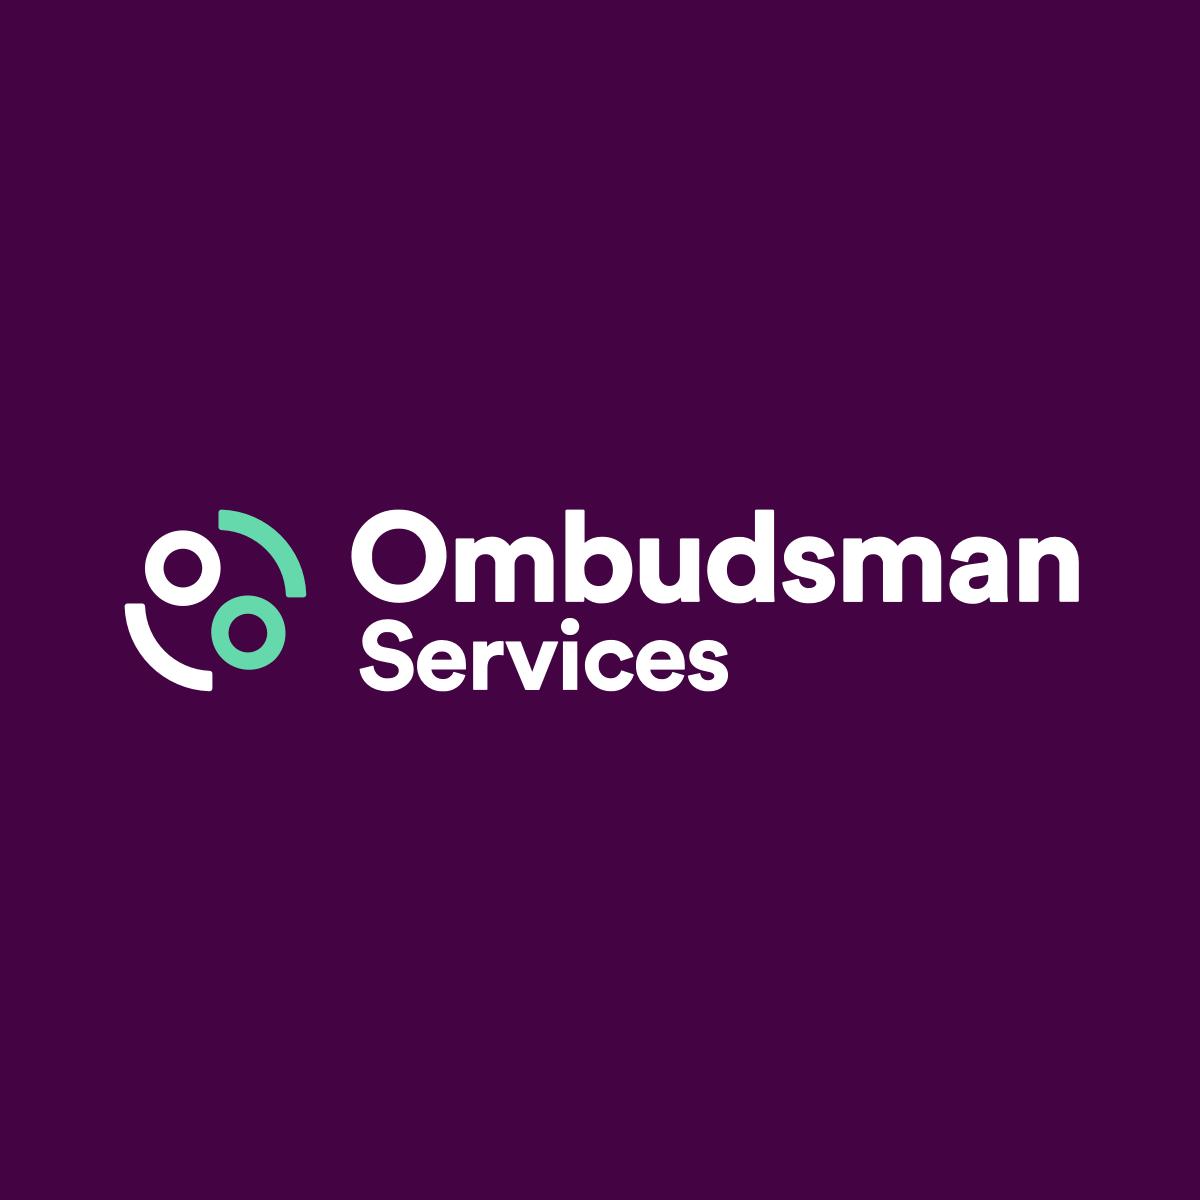 ombudsman-share-image.png